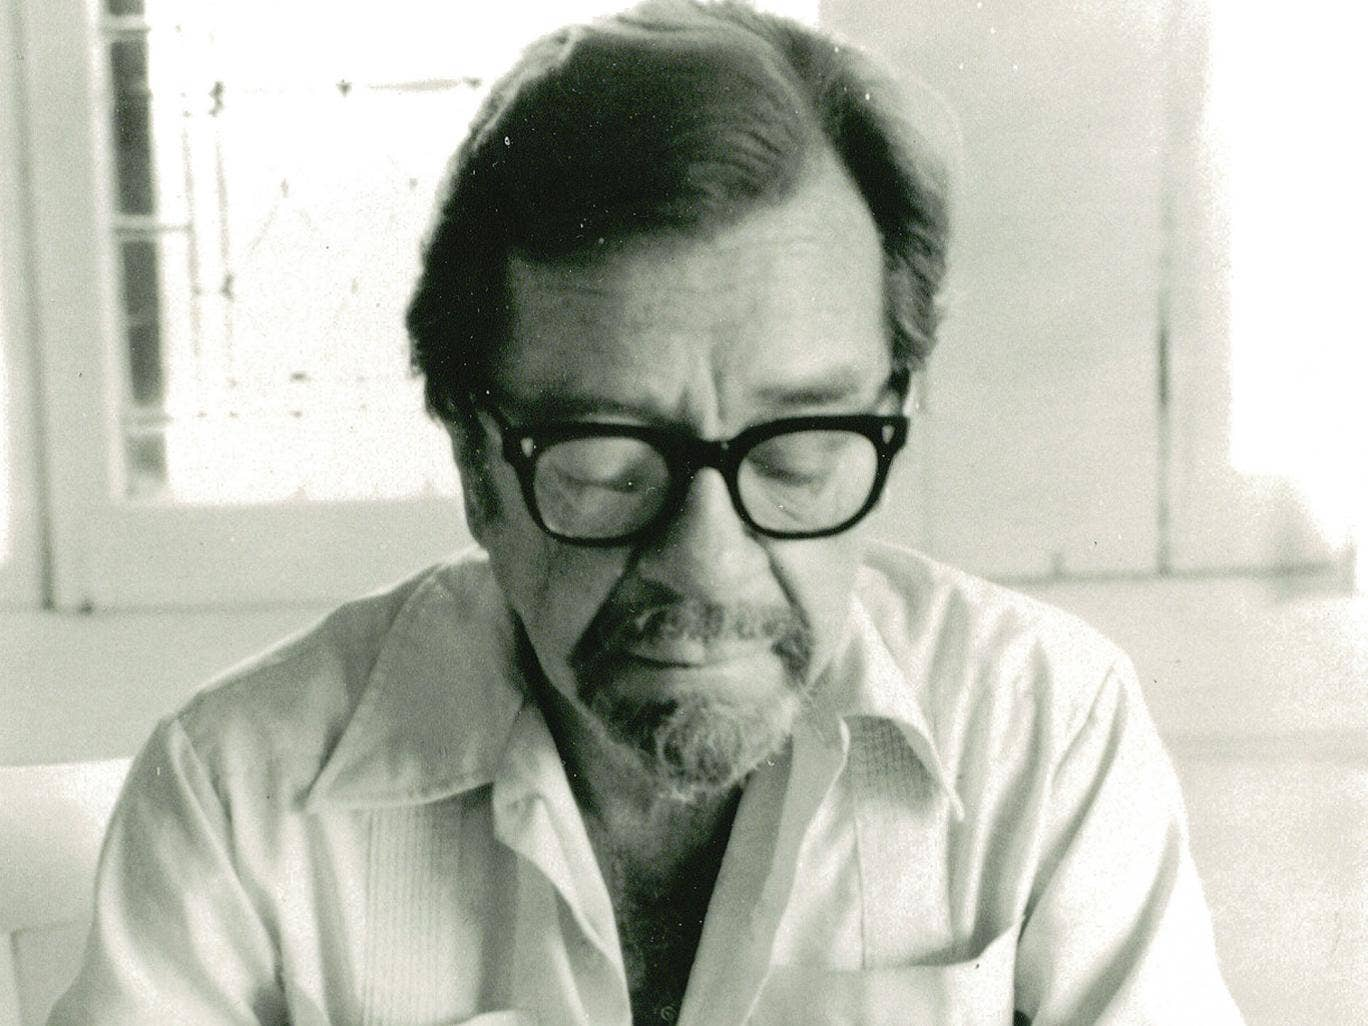 John Williams, author of Stoner